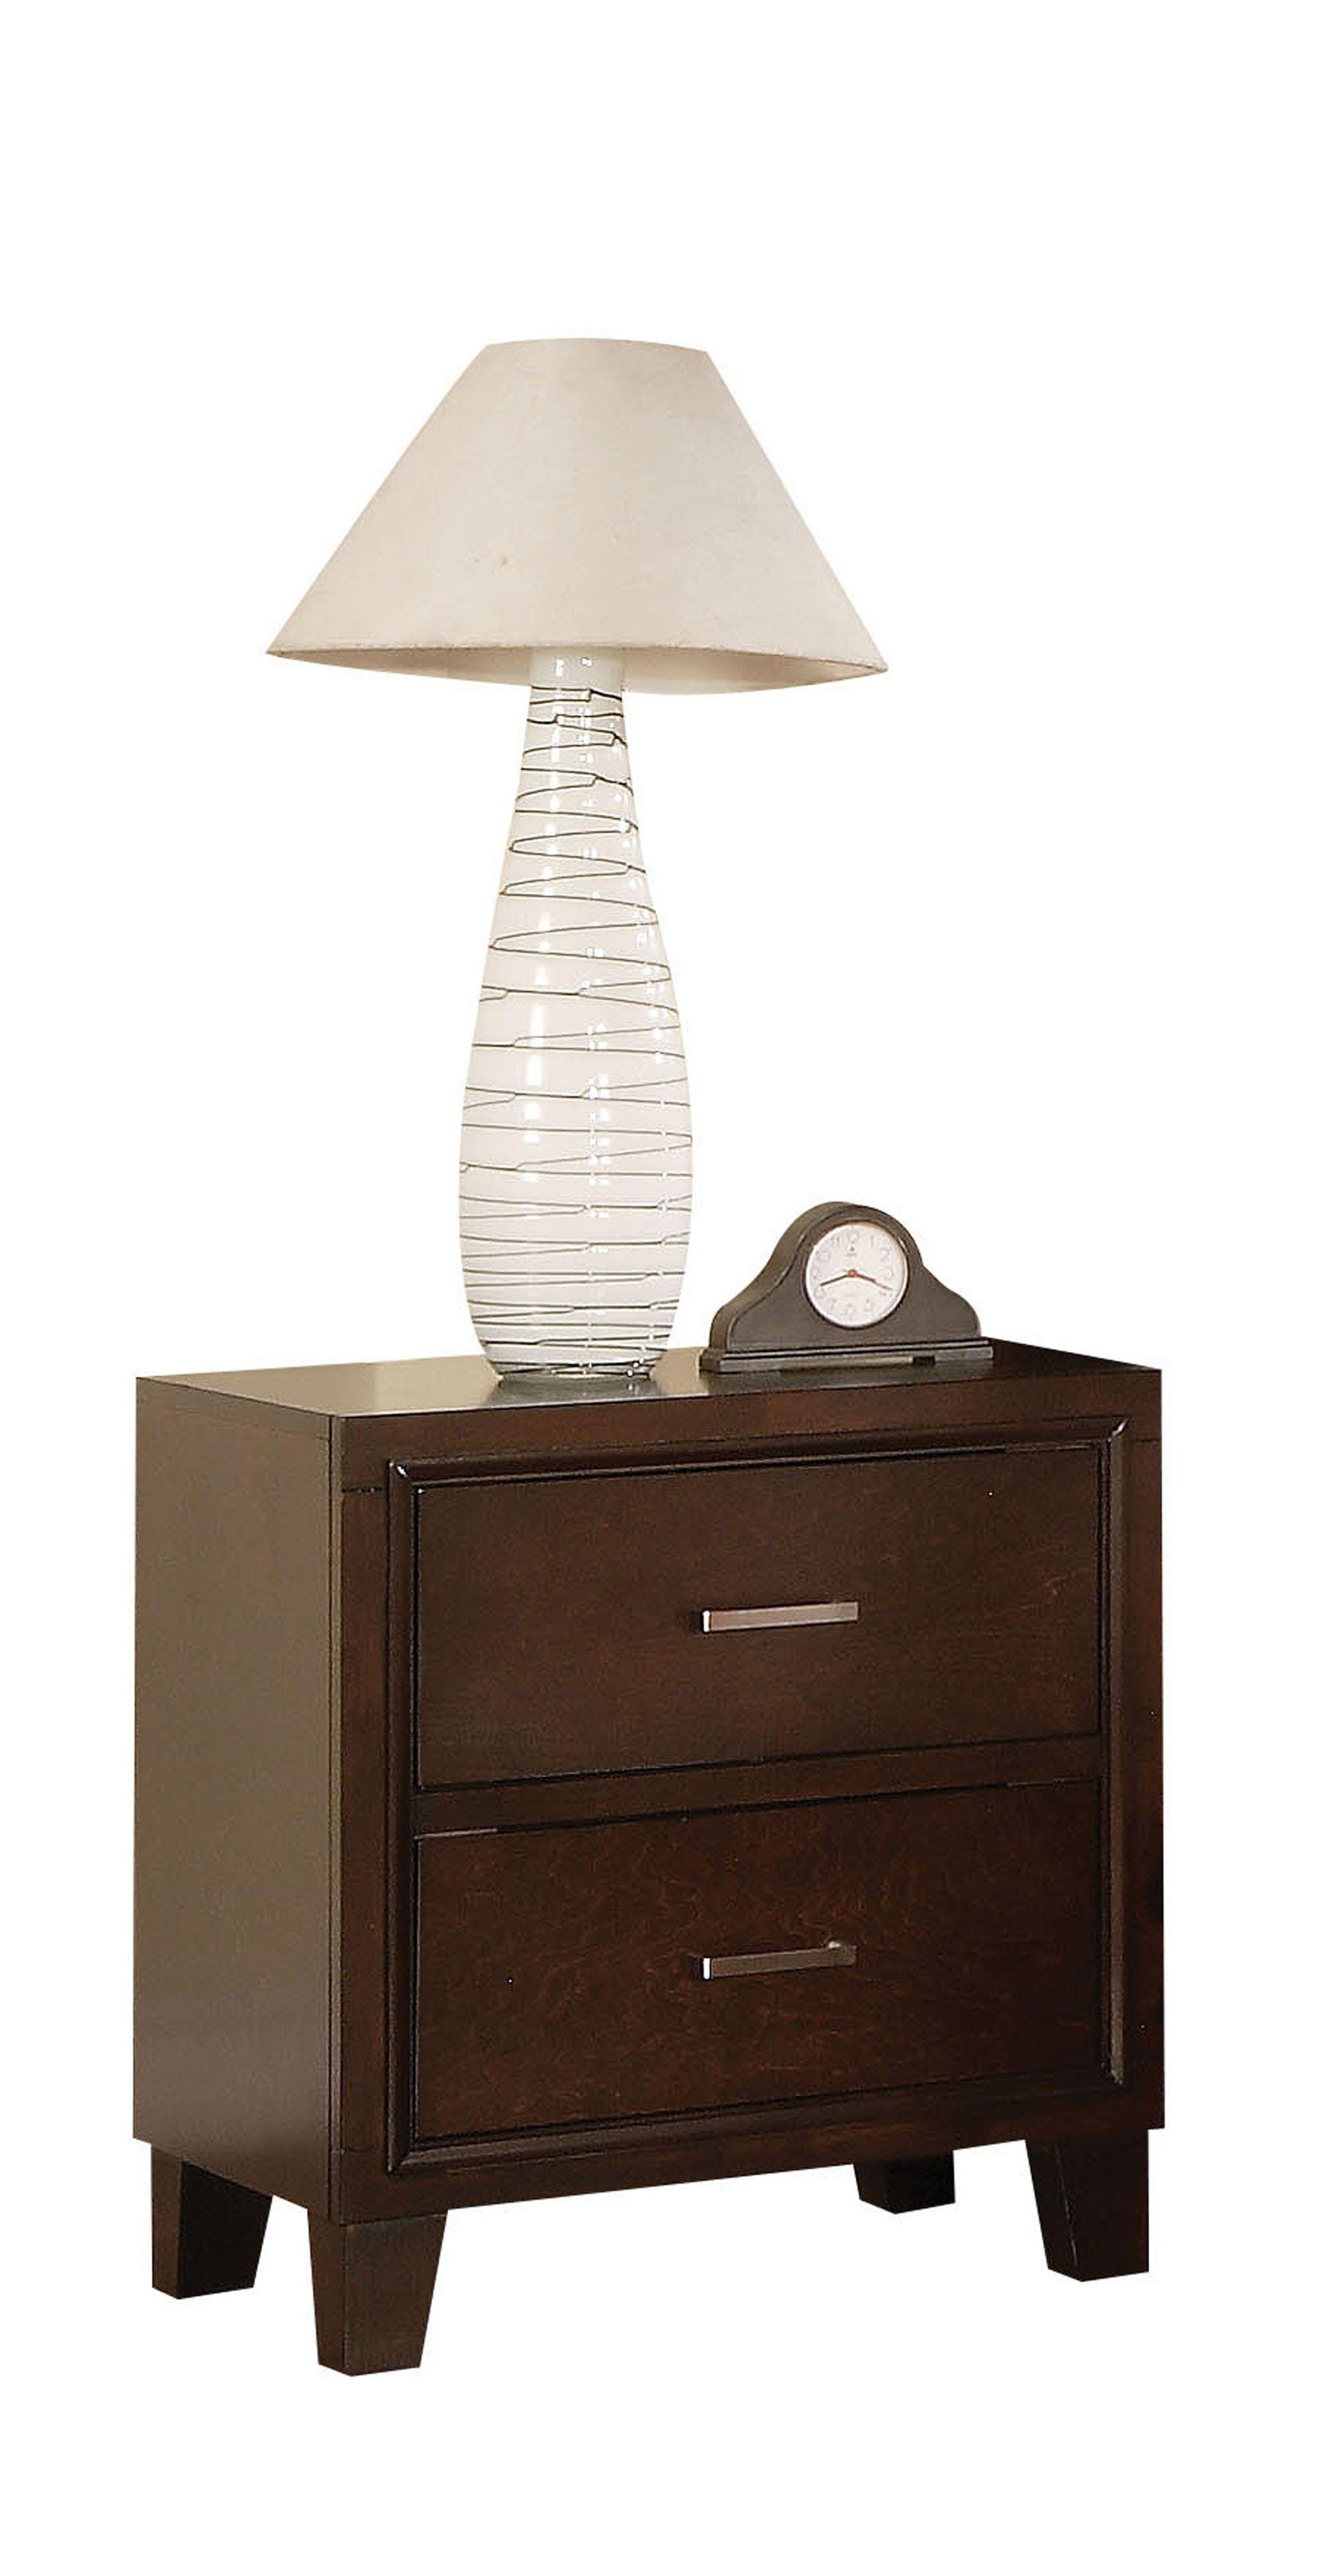 Heckman Contemporary Wooden 2 Drawer Nightstand